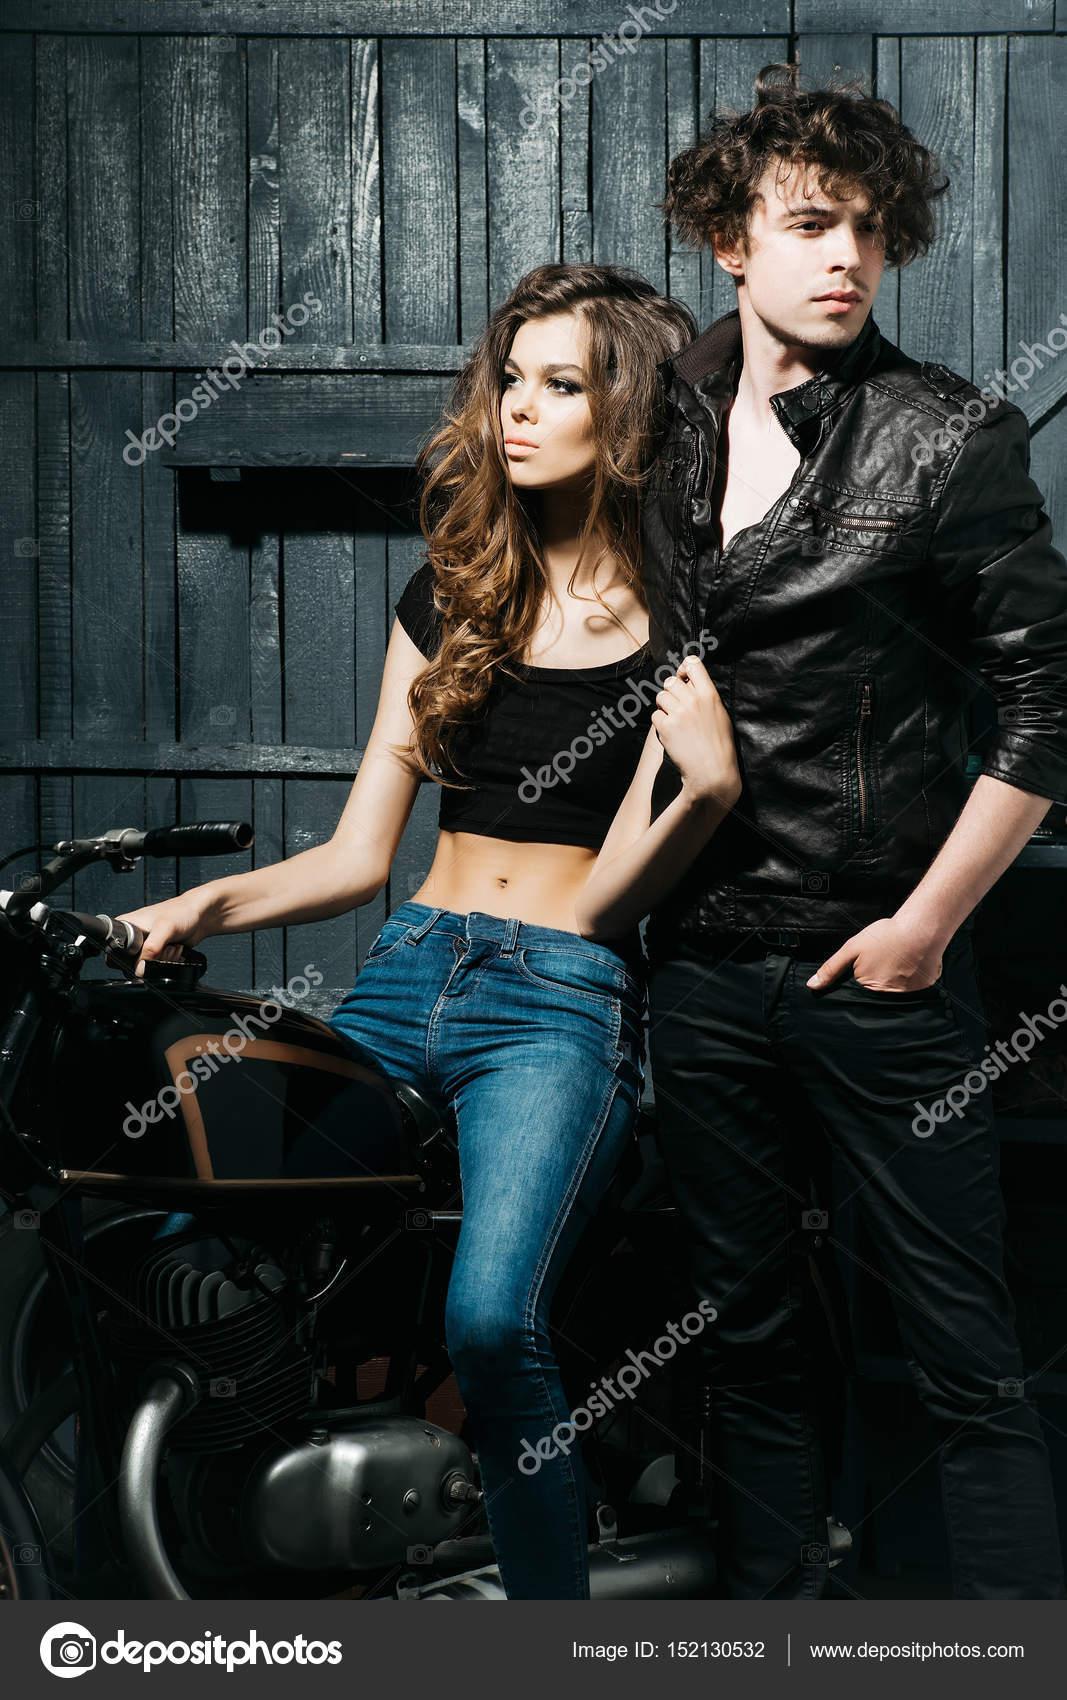 Biker Couple Of Sexy Girl And Handsome Man  Stock Photo  Tverdohlibcom 152130532-3009